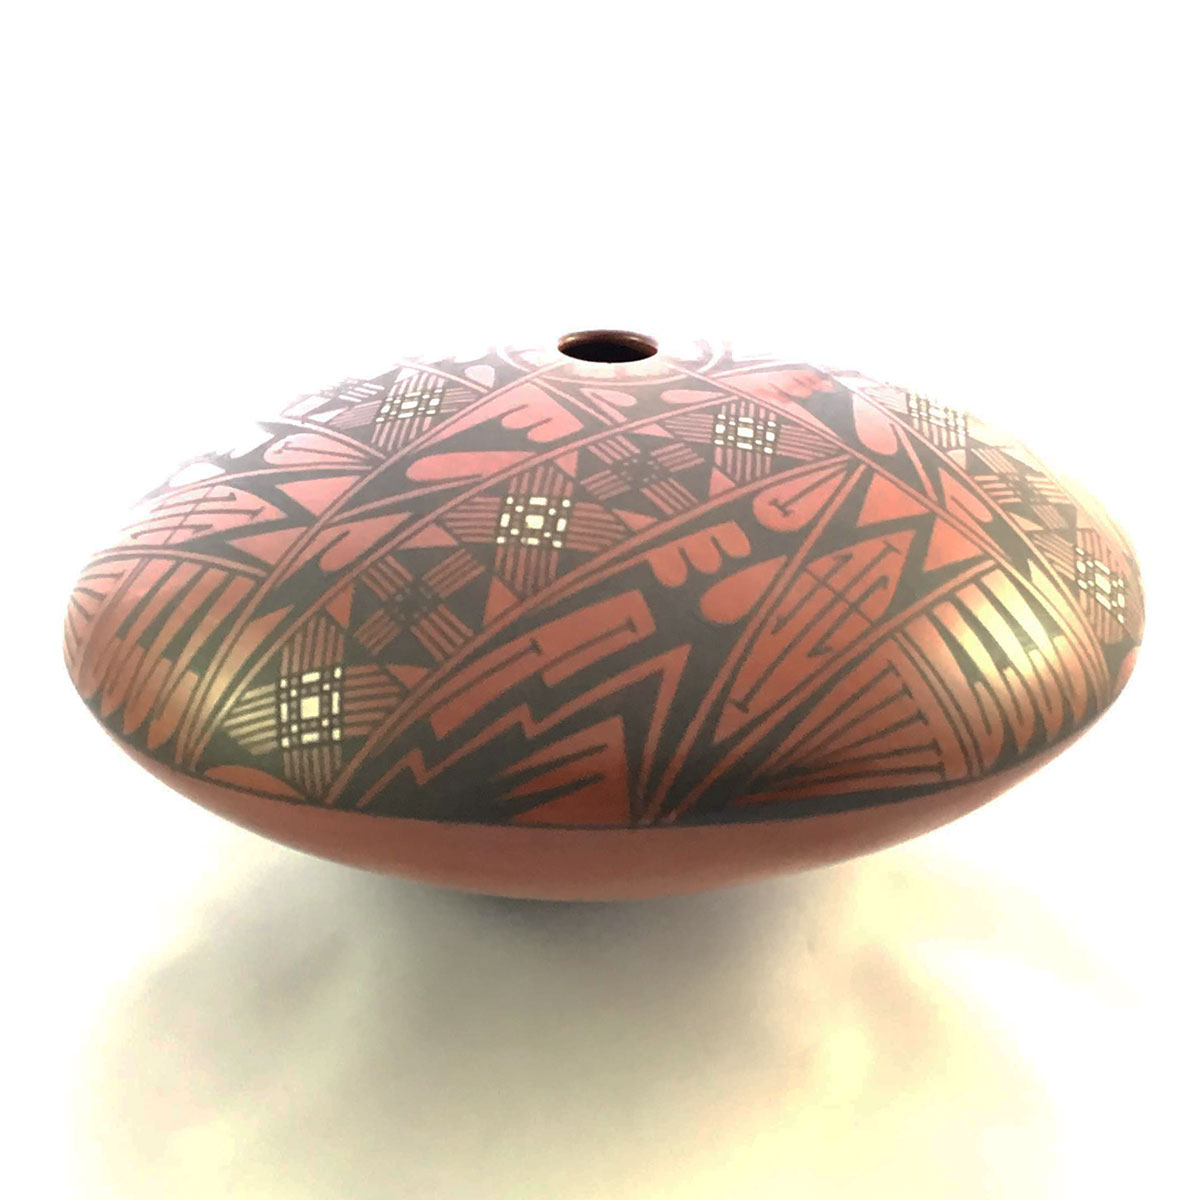 Luis Lopez Luis Lopez: Medium-sized Pot Mata Ortiz Pottery